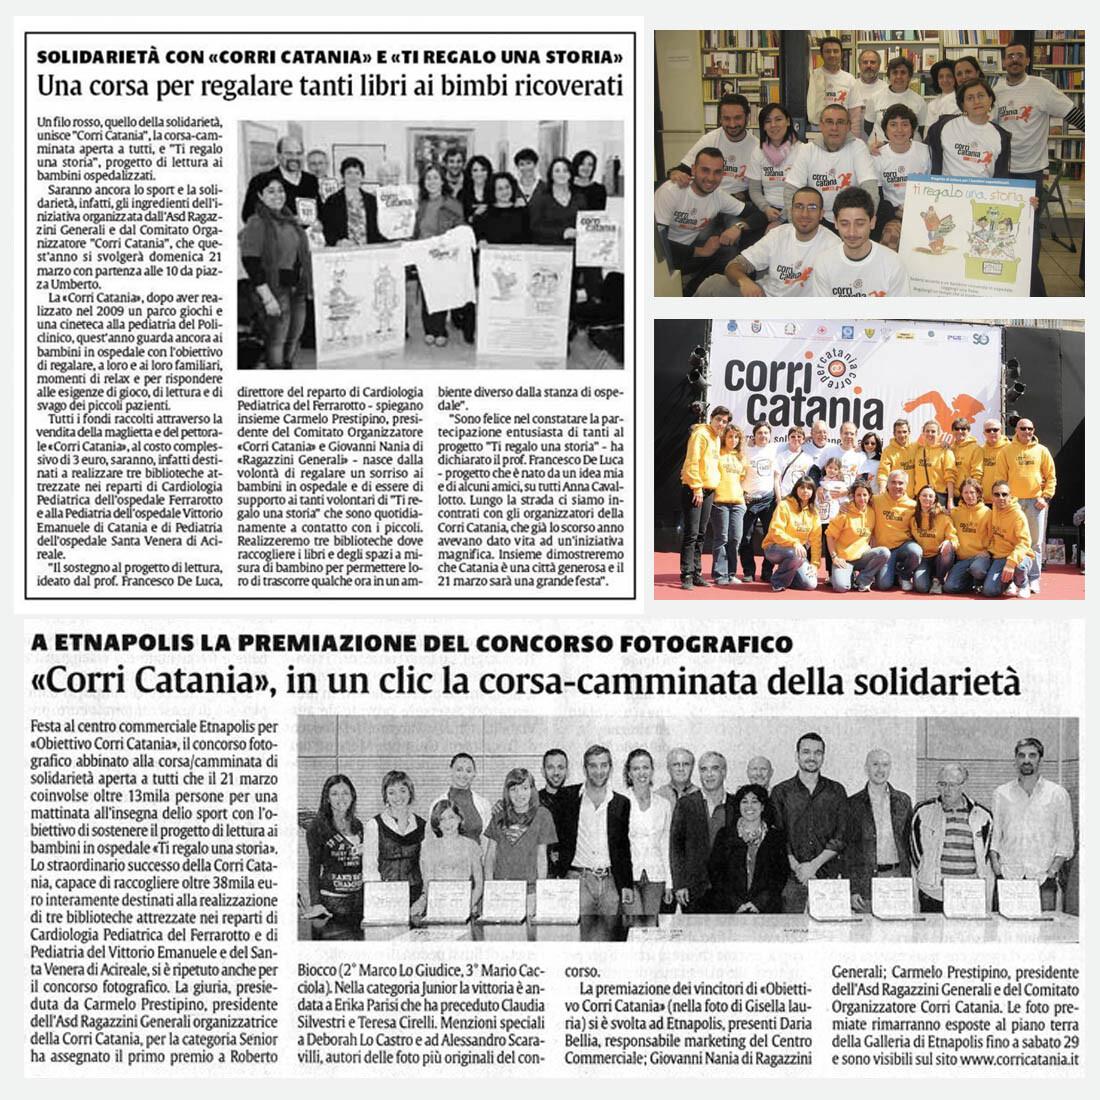 Corri Catania - Ti regalo una storia - artebit